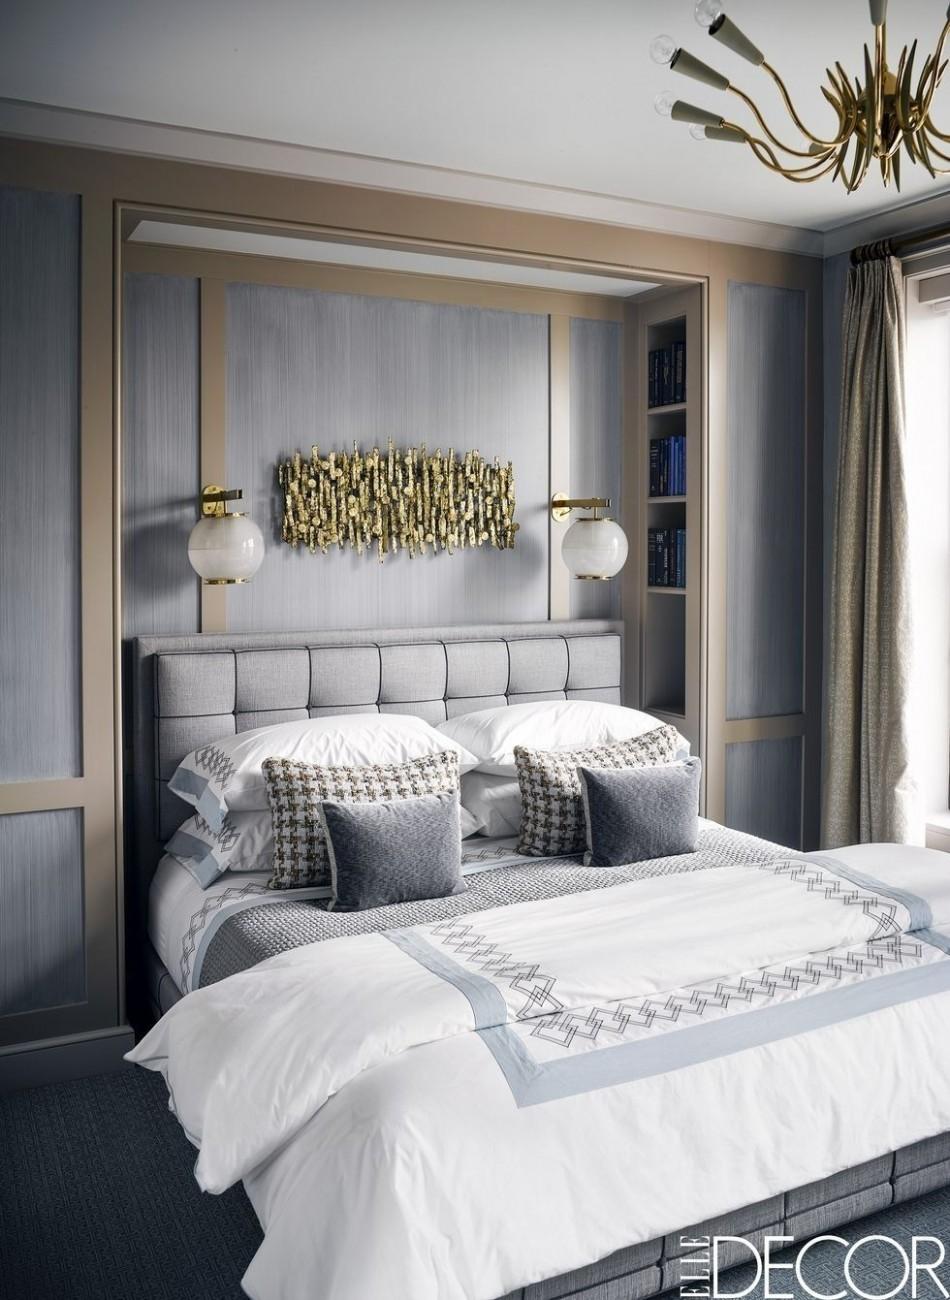 9+ Bedroom Lighting Ideas - Unique Lights for Bedrooms - Bedroom Ideas With Lights